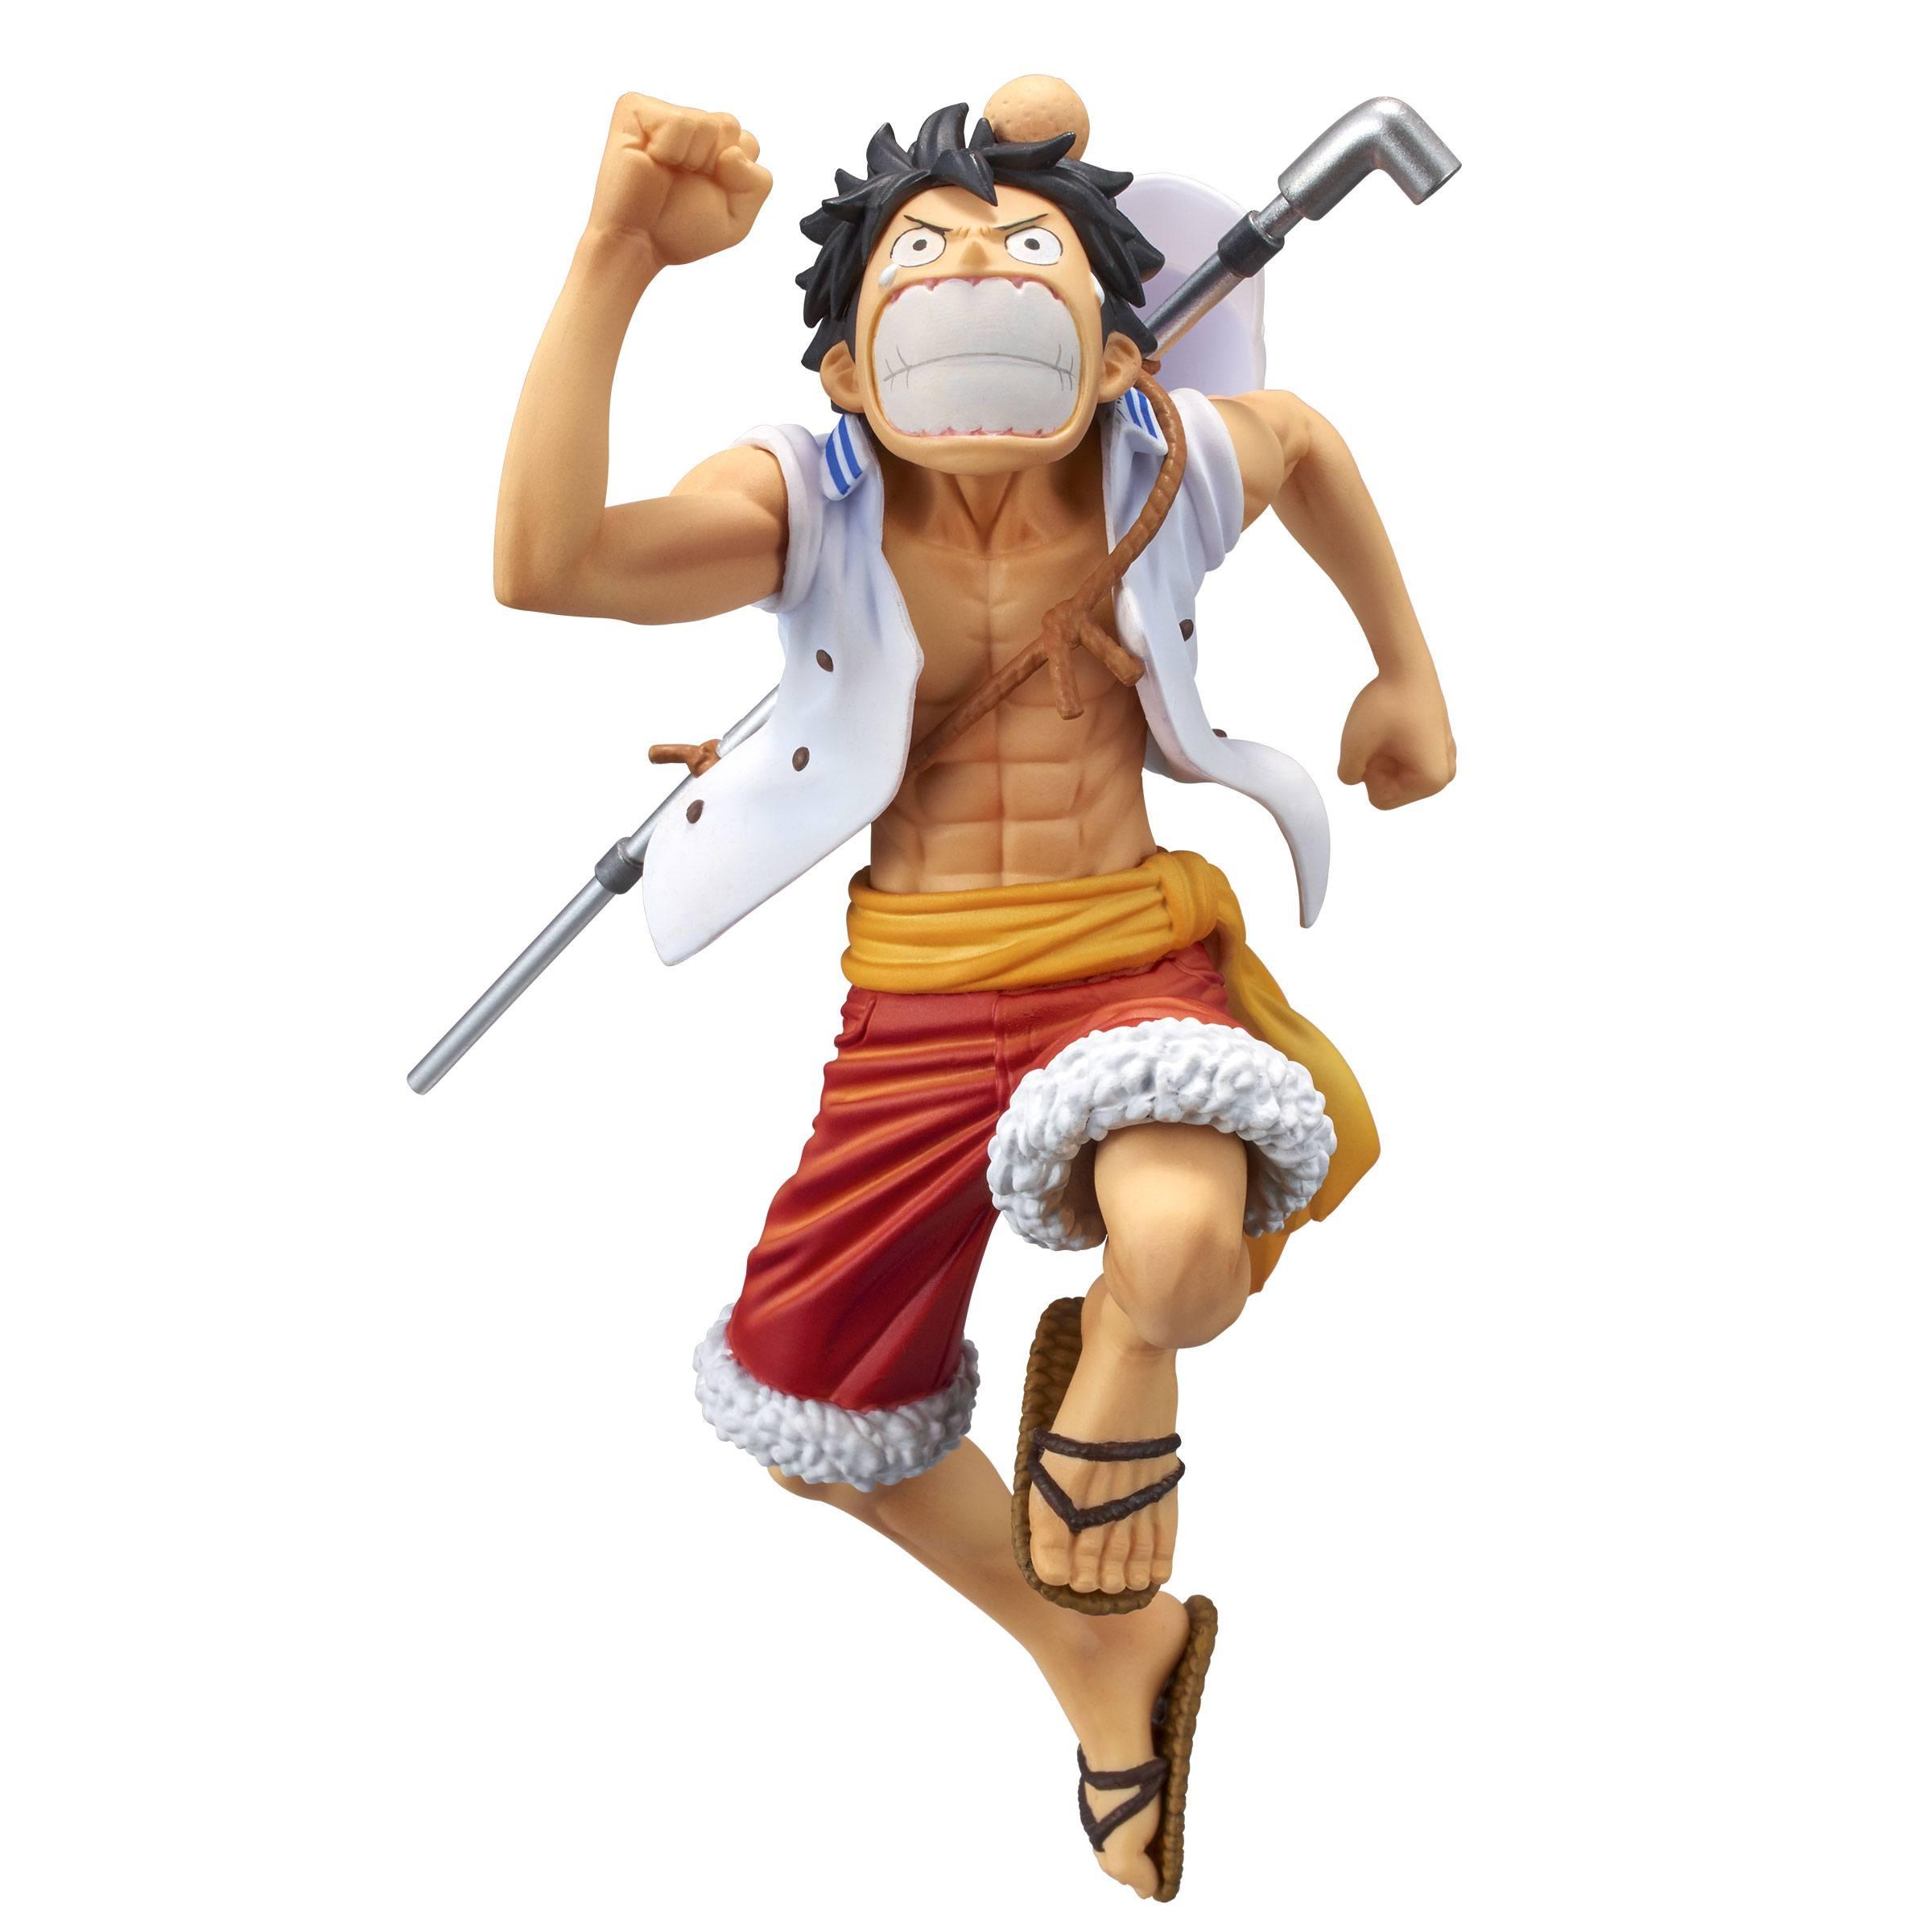 *PREORDER* One Piece Magazine: MONKEY D. LUFFY - SPECIAL COLOR by Banpresto